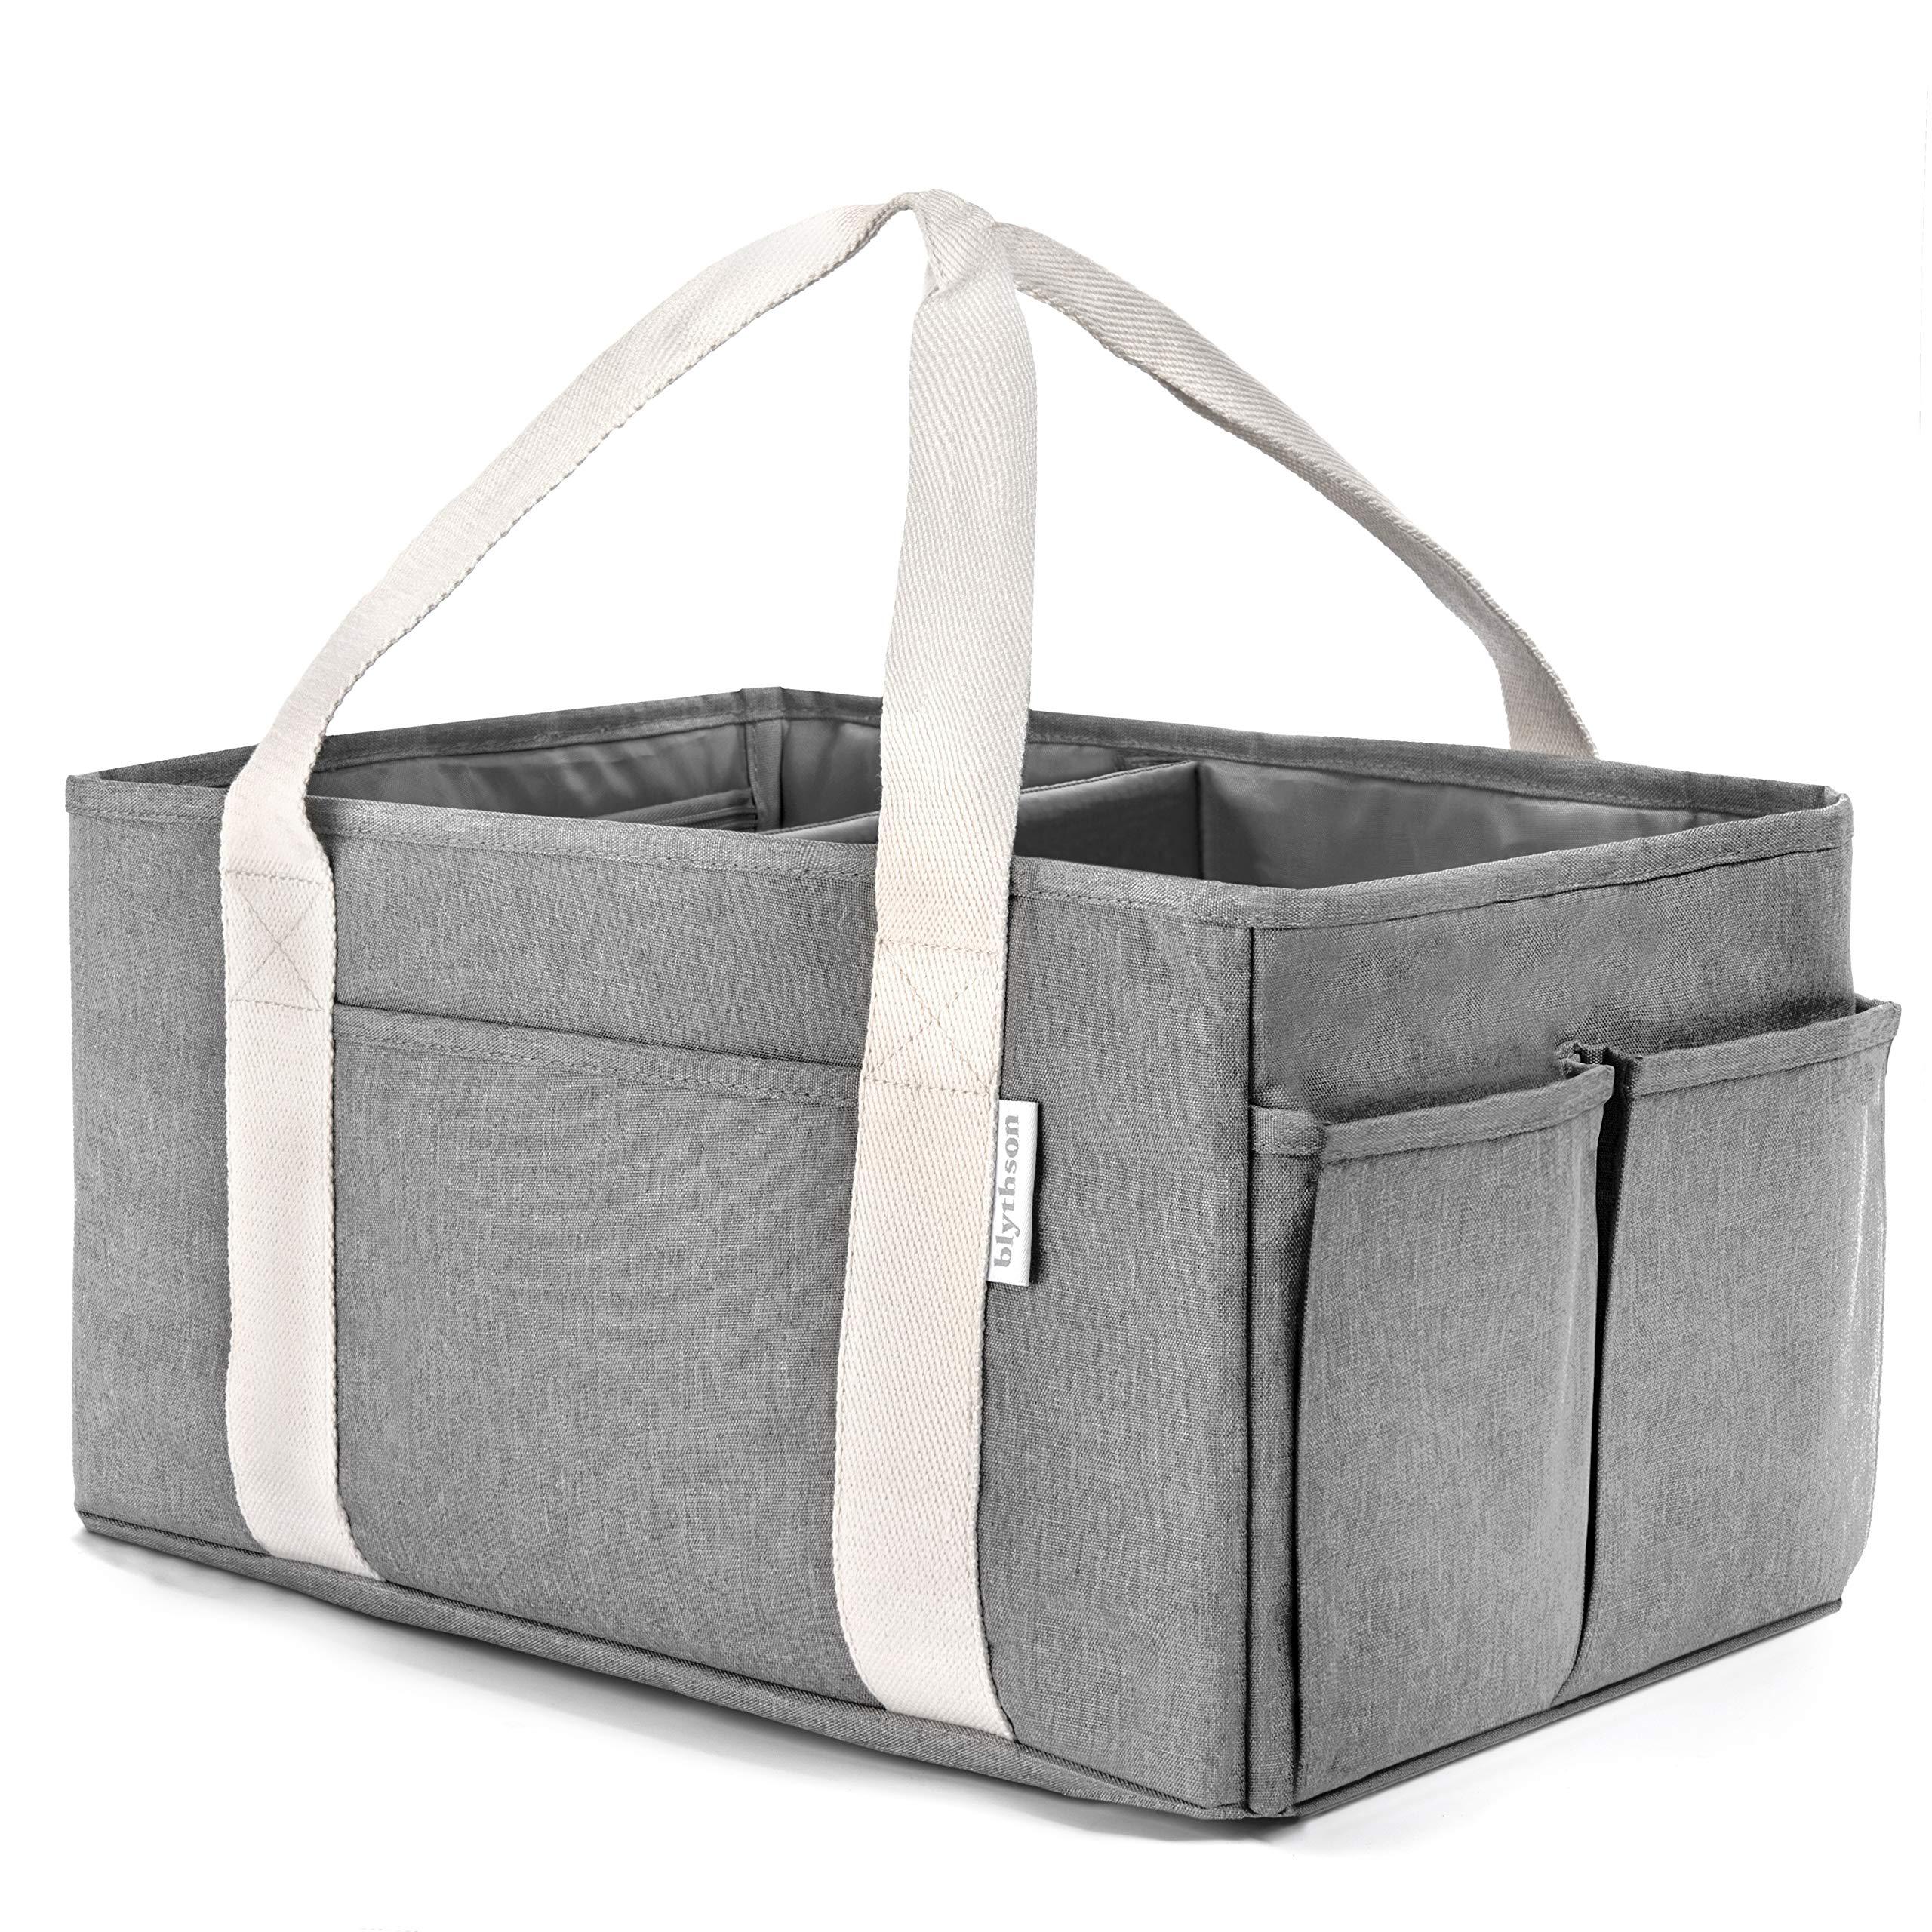 Blythson Baby Diaper Caddy Organizer, Portable Nursery Storage Bin, Grey by Blythson